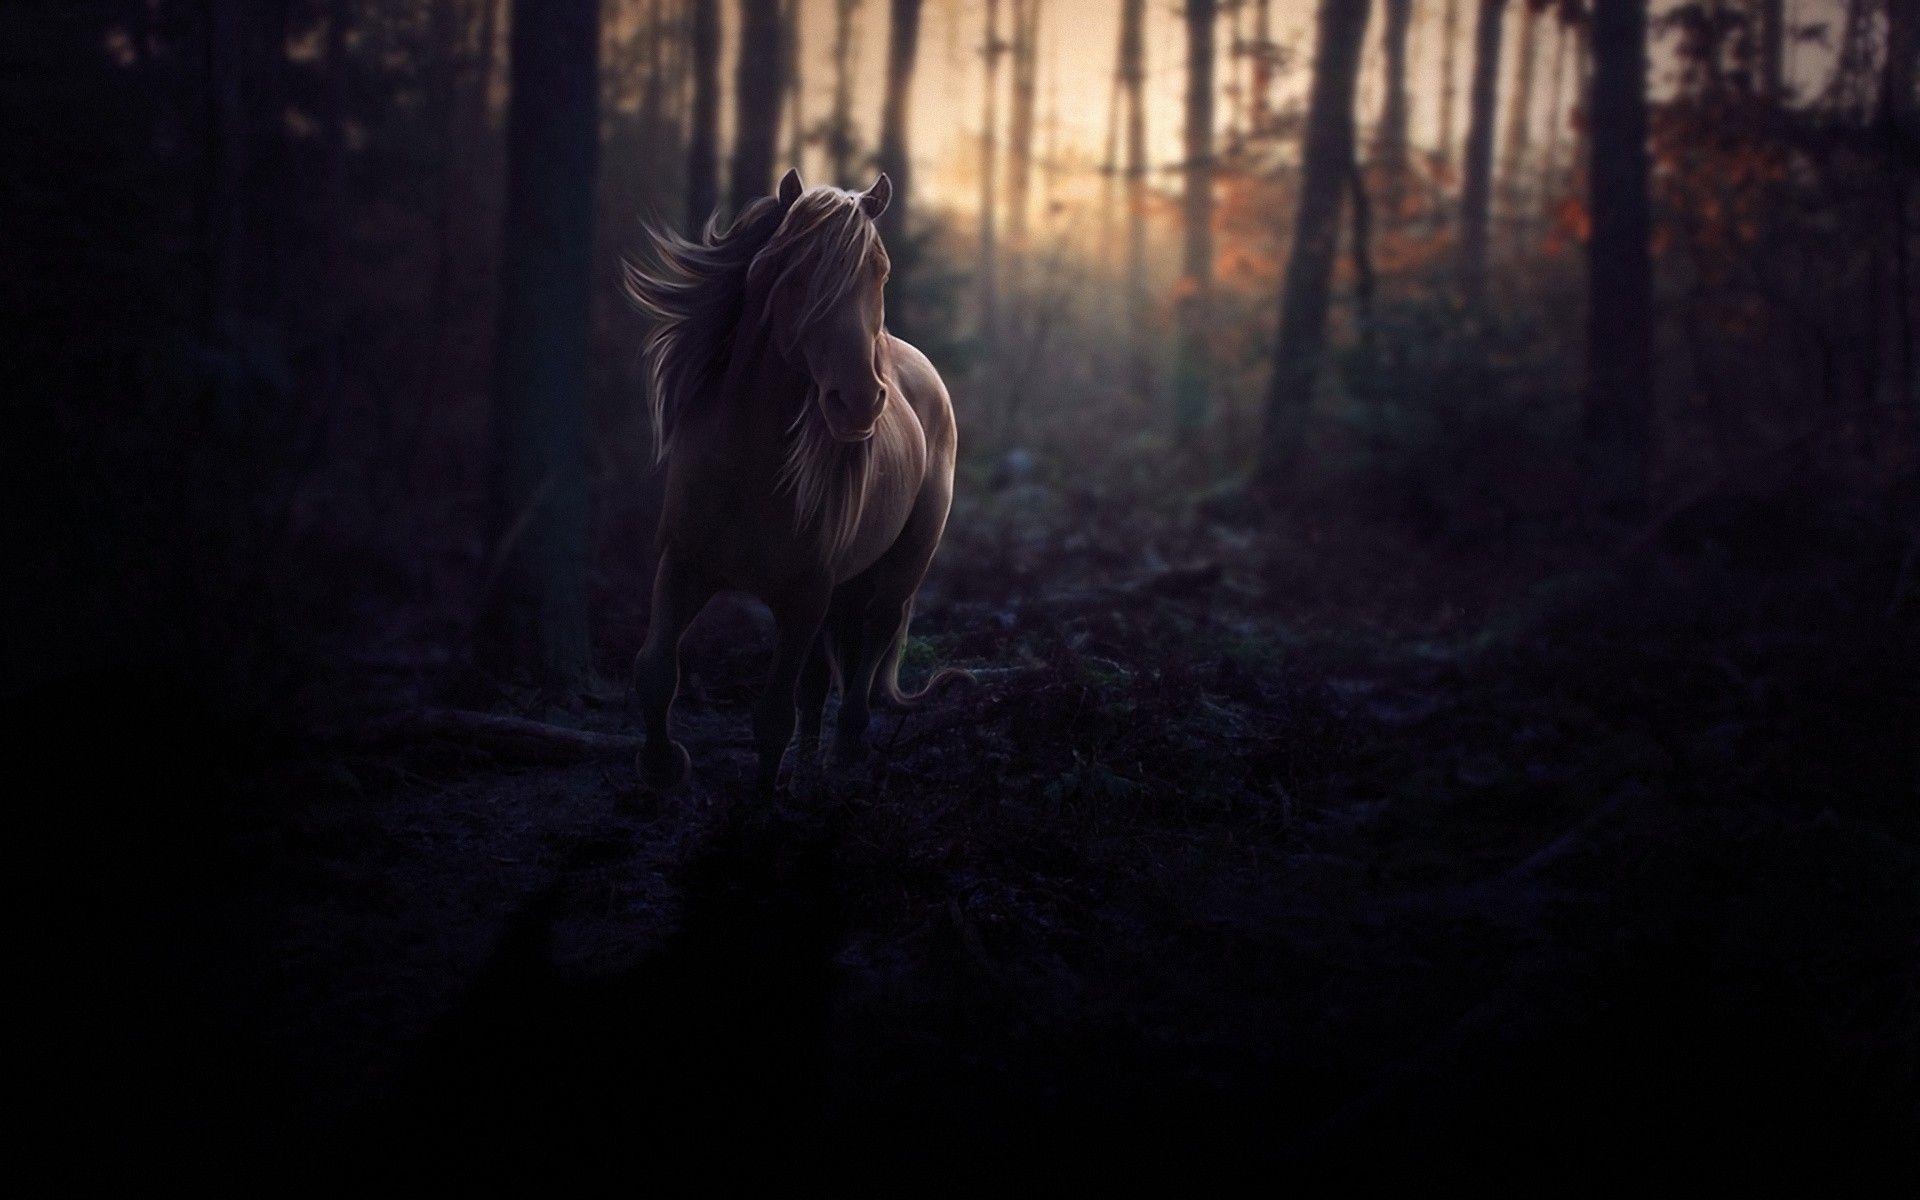 Dark Forest Hd Wallpapers Top Free Dark Forest Hd